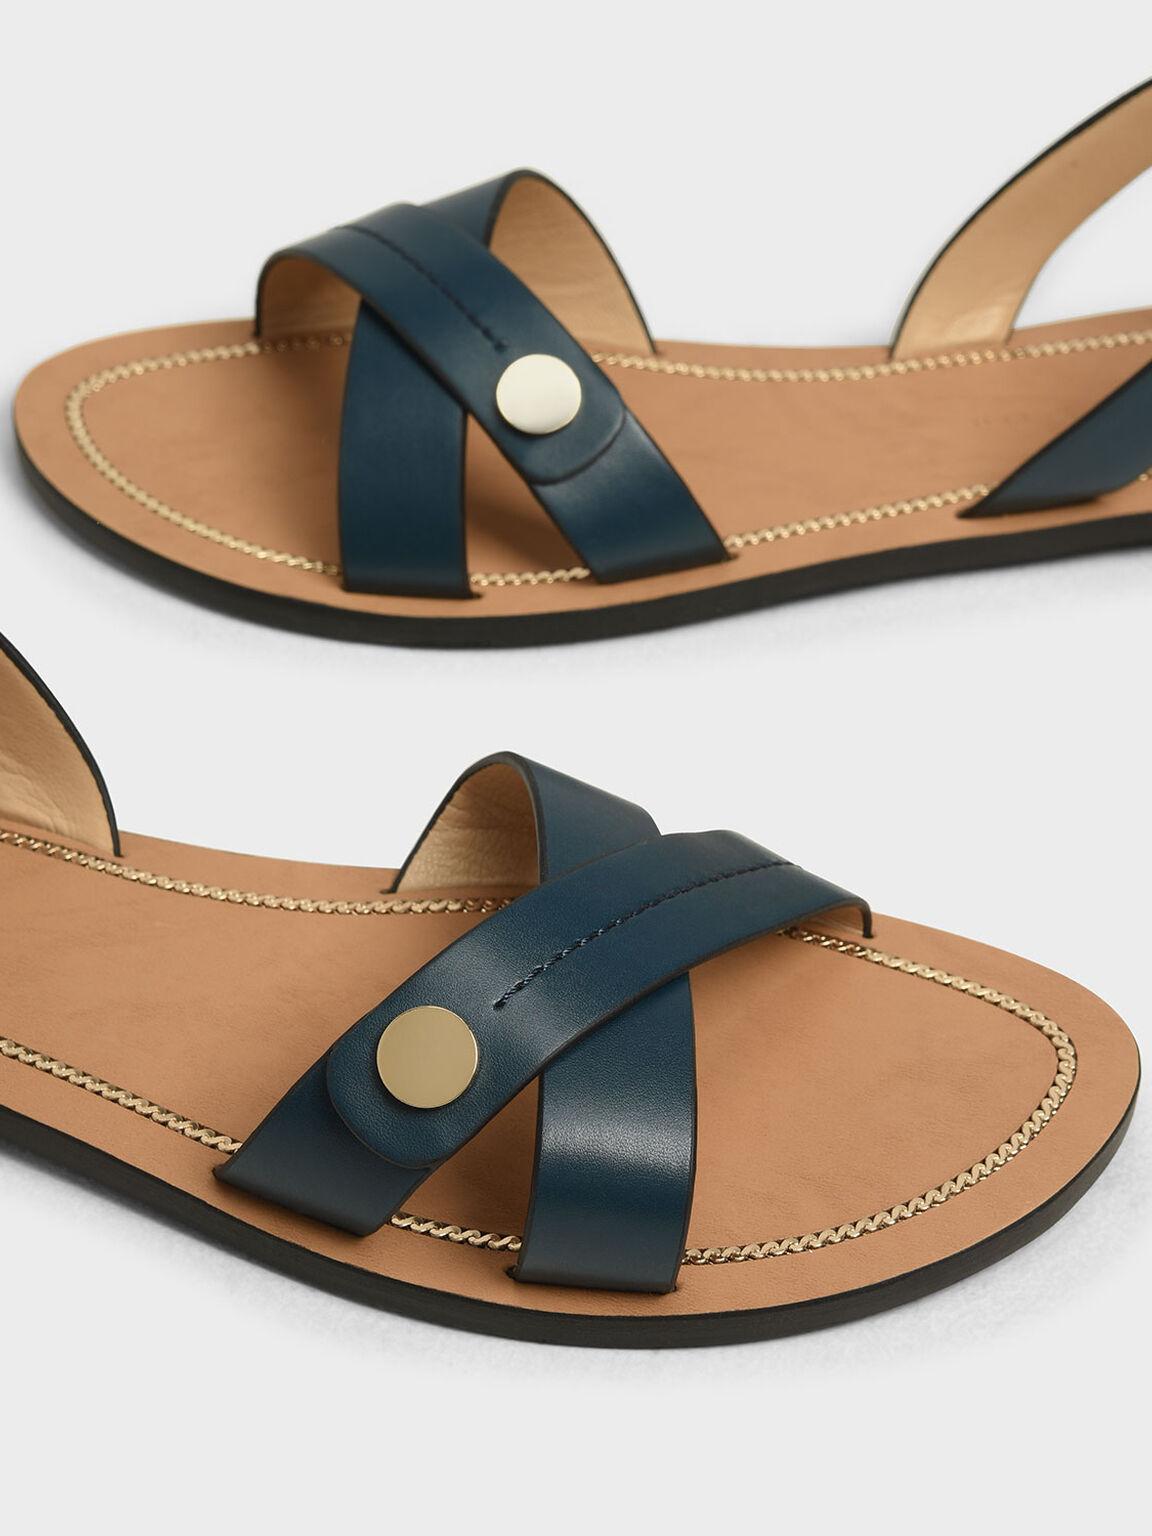 Button Detail Criss Cross Sandals, Teal, hi-res